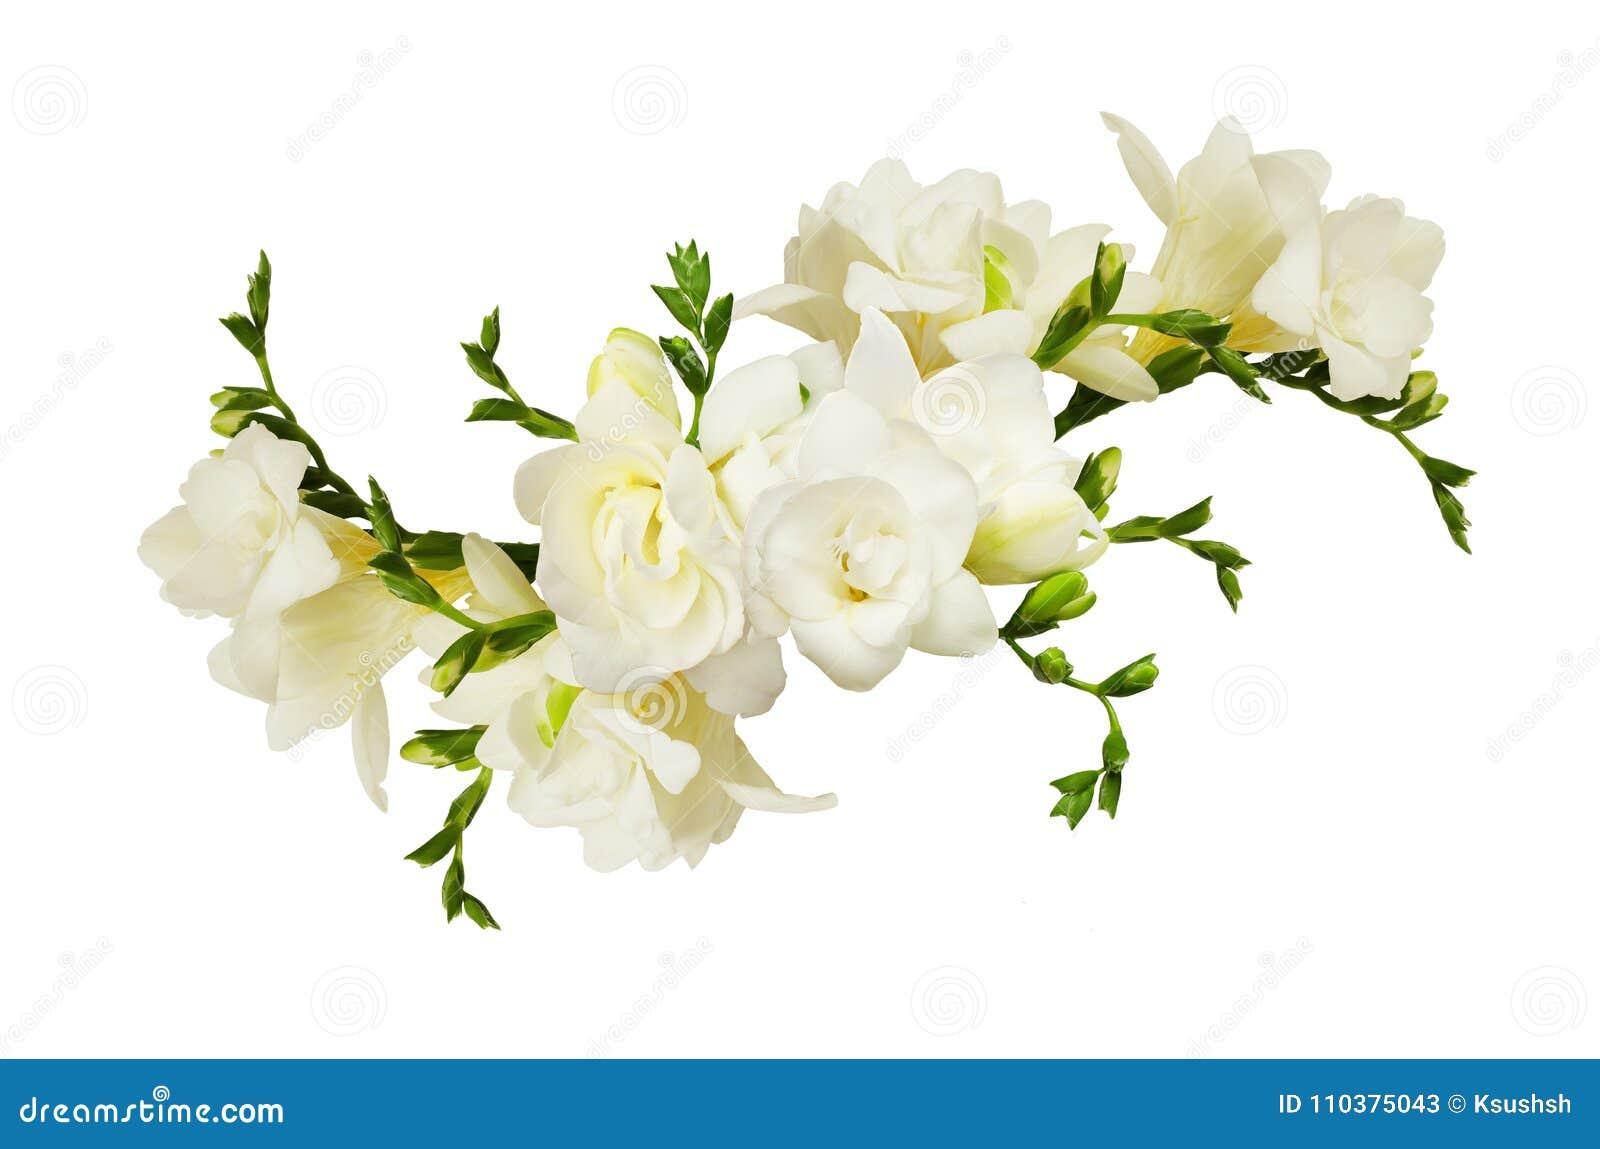 White freesia flowers in a beautiful arrangment stock image image white freesia flowers in a beautiful arrangment mightylinksfo